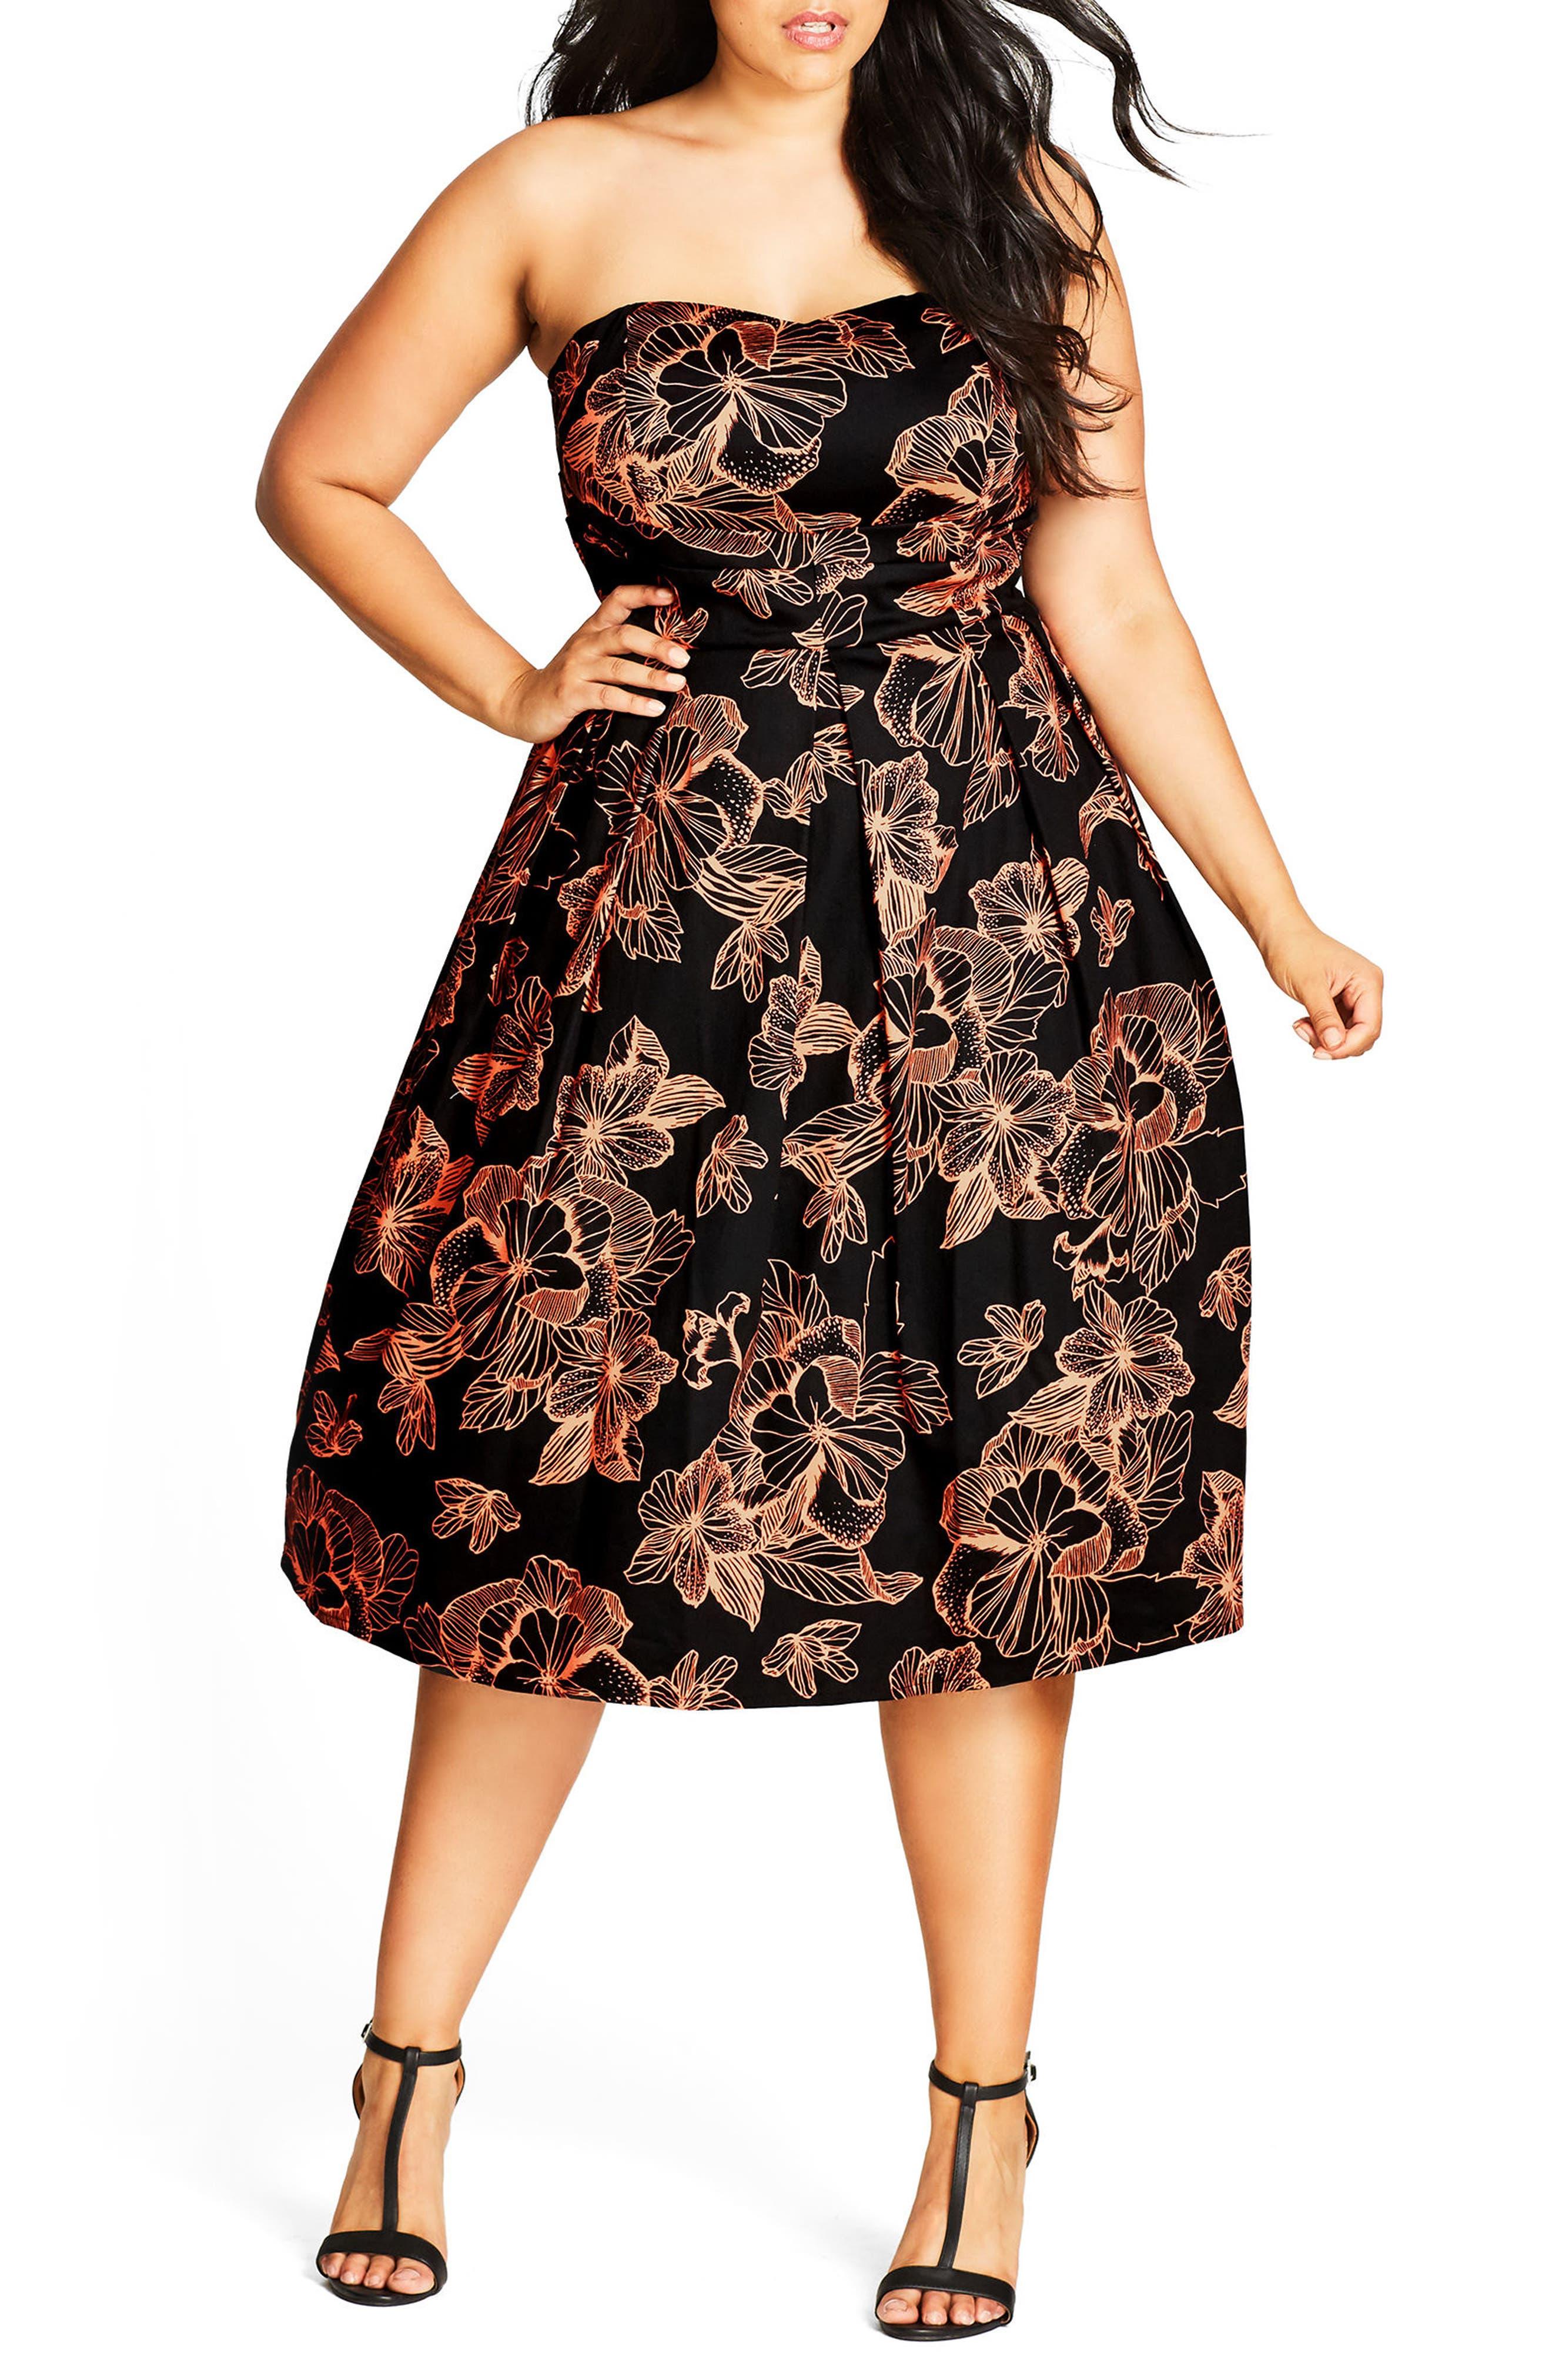 Main Image - City Chic Floral Outline Fit & Flare Dress (Plus Size)